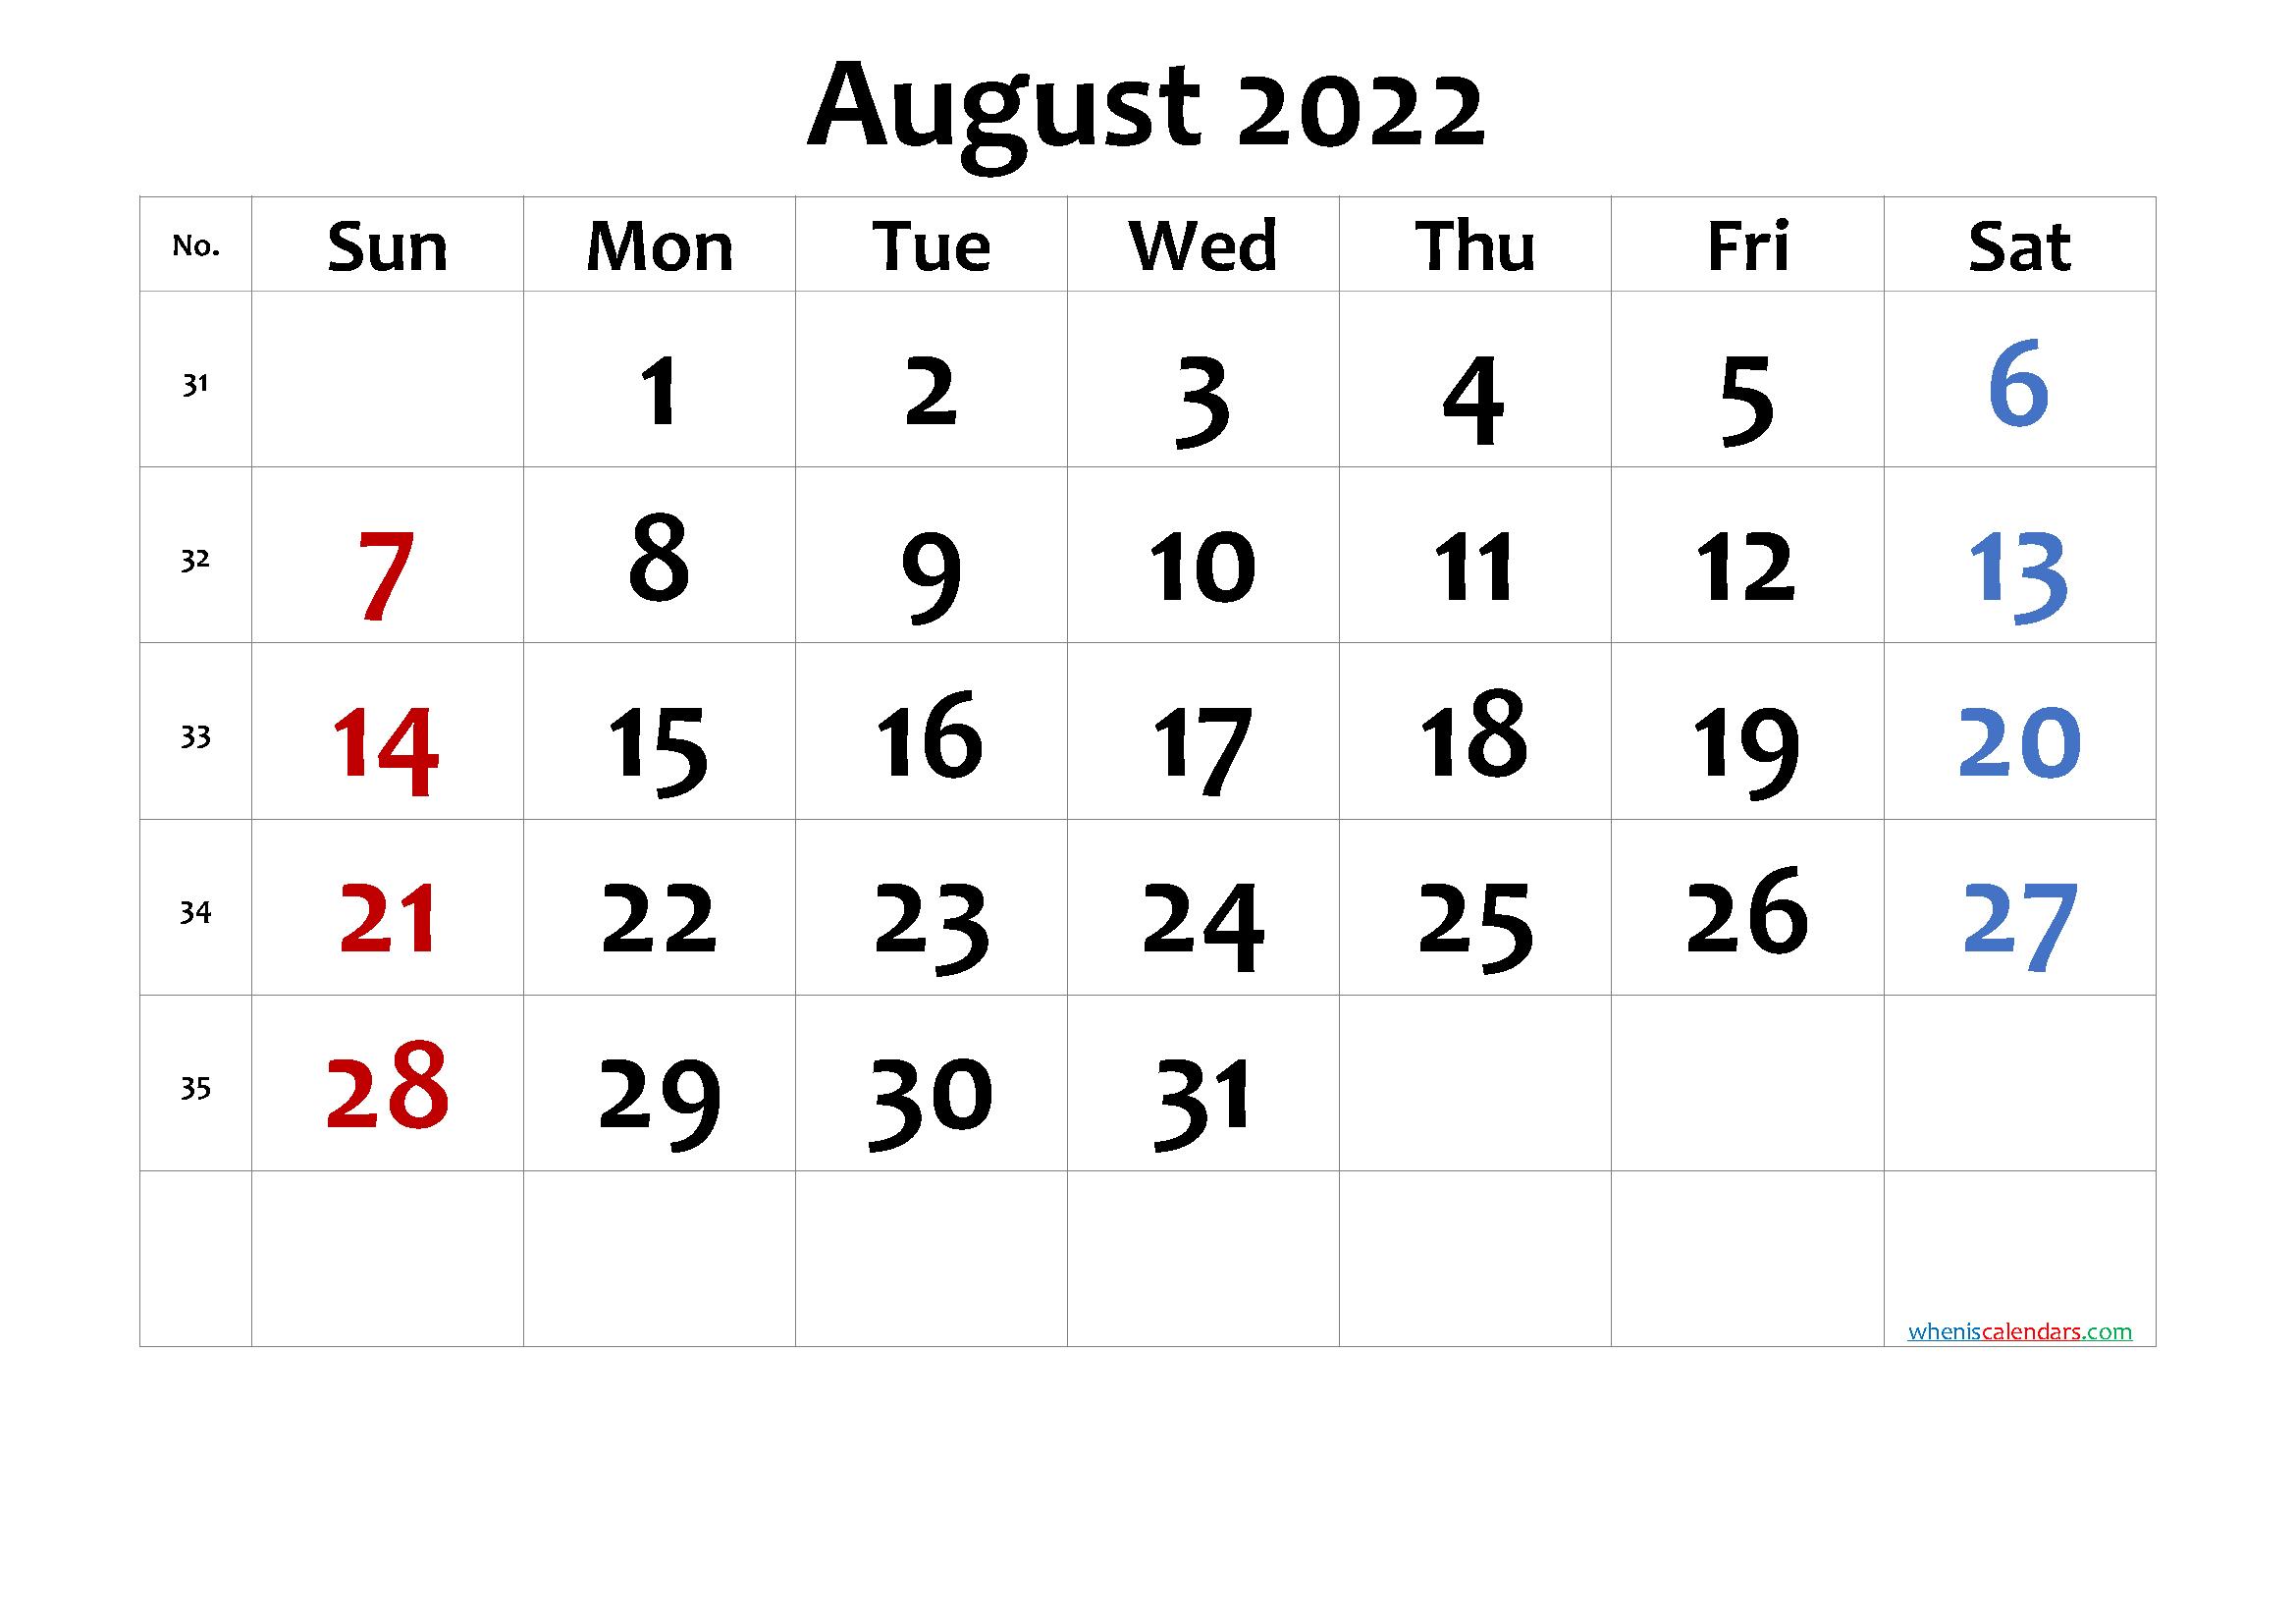 Free Printable Calendar August 2022.Printable Calendar 2022 August Free Printable 2021 Monthly Calendar With Holidays